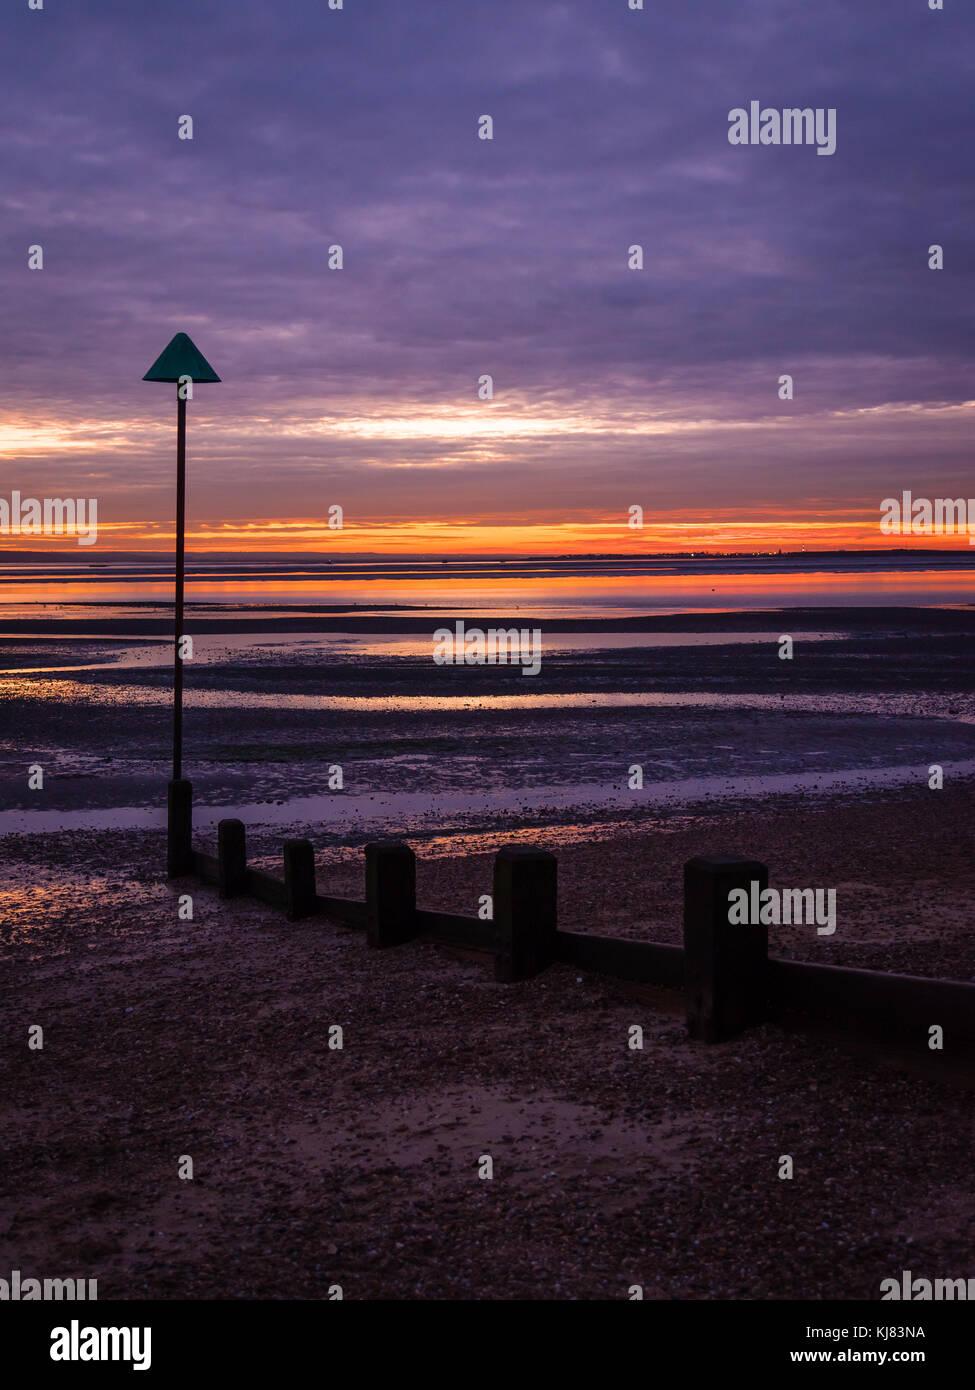 Sun setting on Chalkwell beach - Stock Image